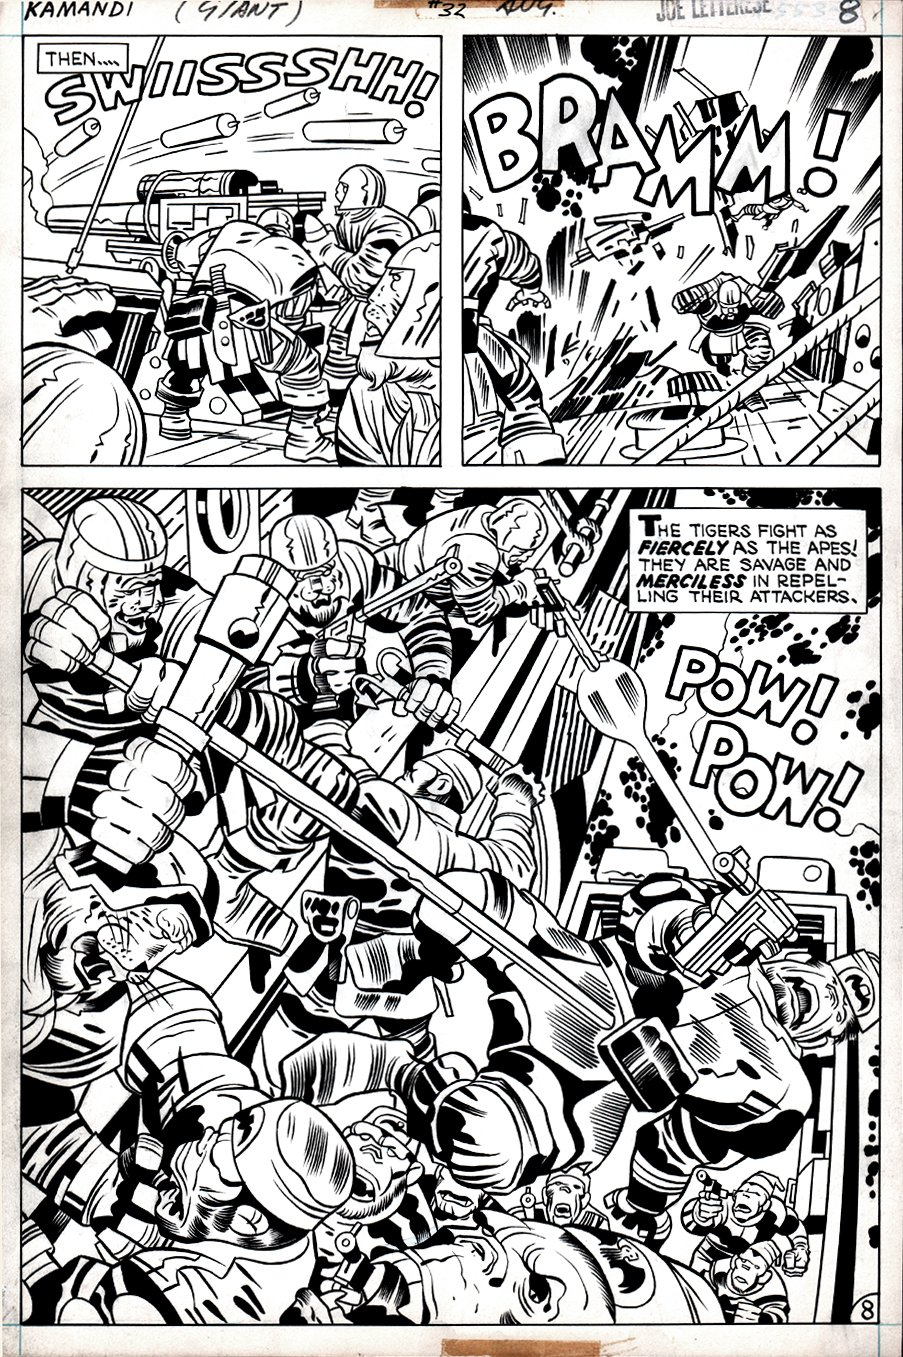 Kamandi #32 p 8 SPLASH  (Tiger Men Battle The Gorilla Commandos!) 1975